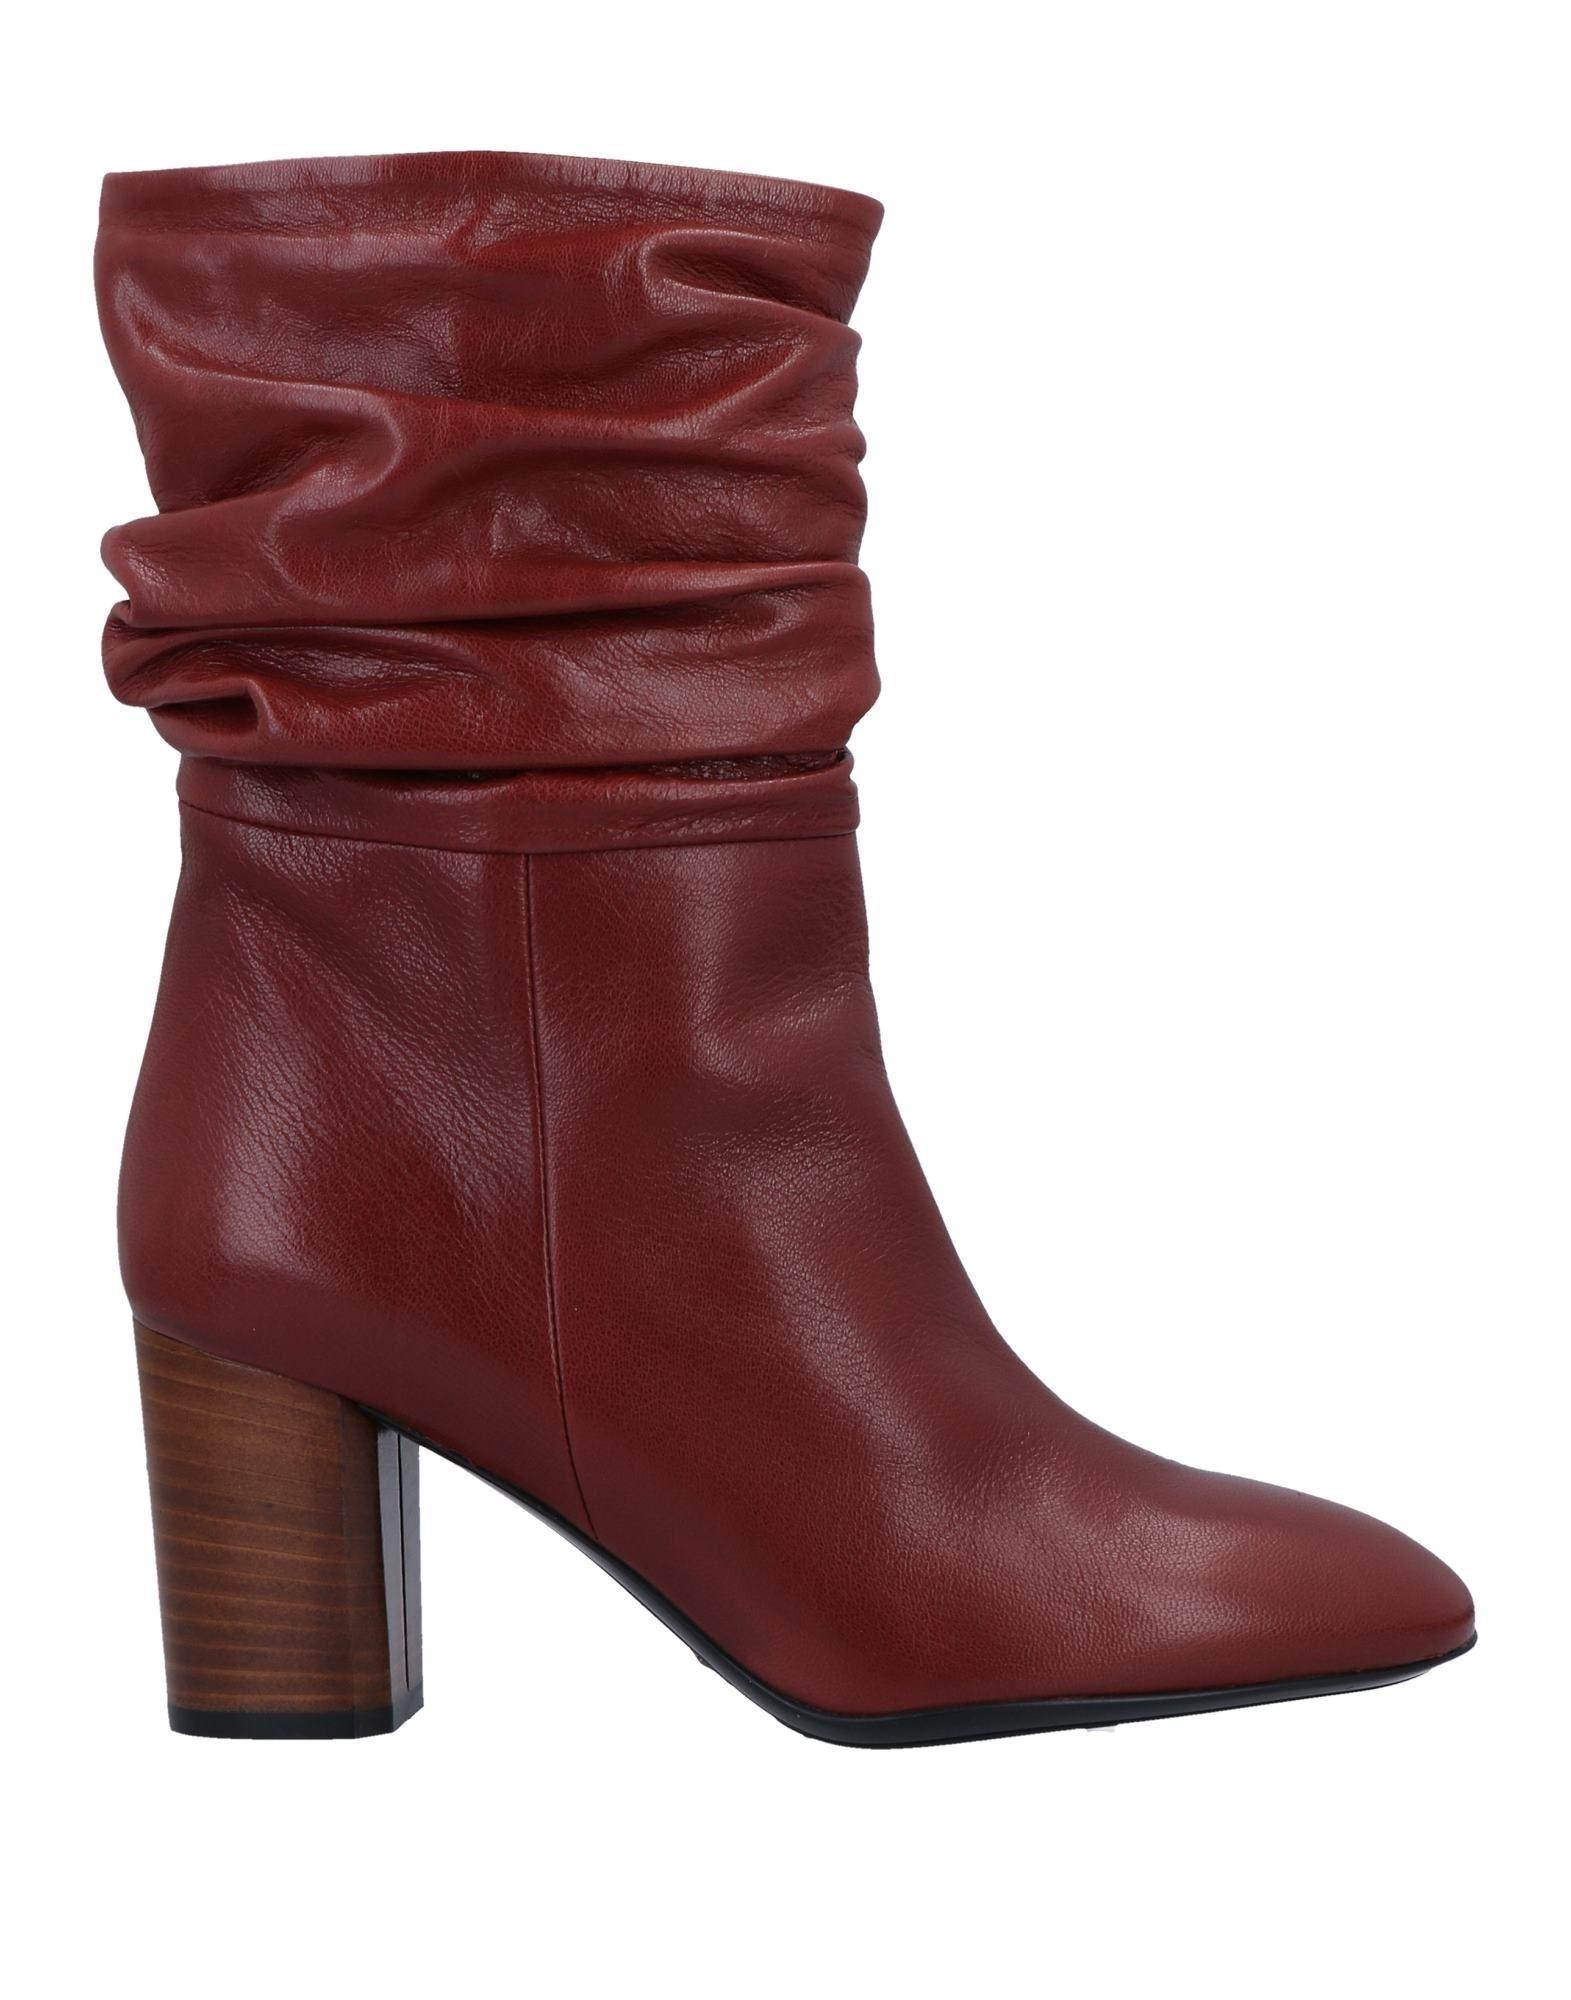 MODA DI FAUSTO Полусапоги и высокие ботинки cardigan moda di chiara кардиганы длинные